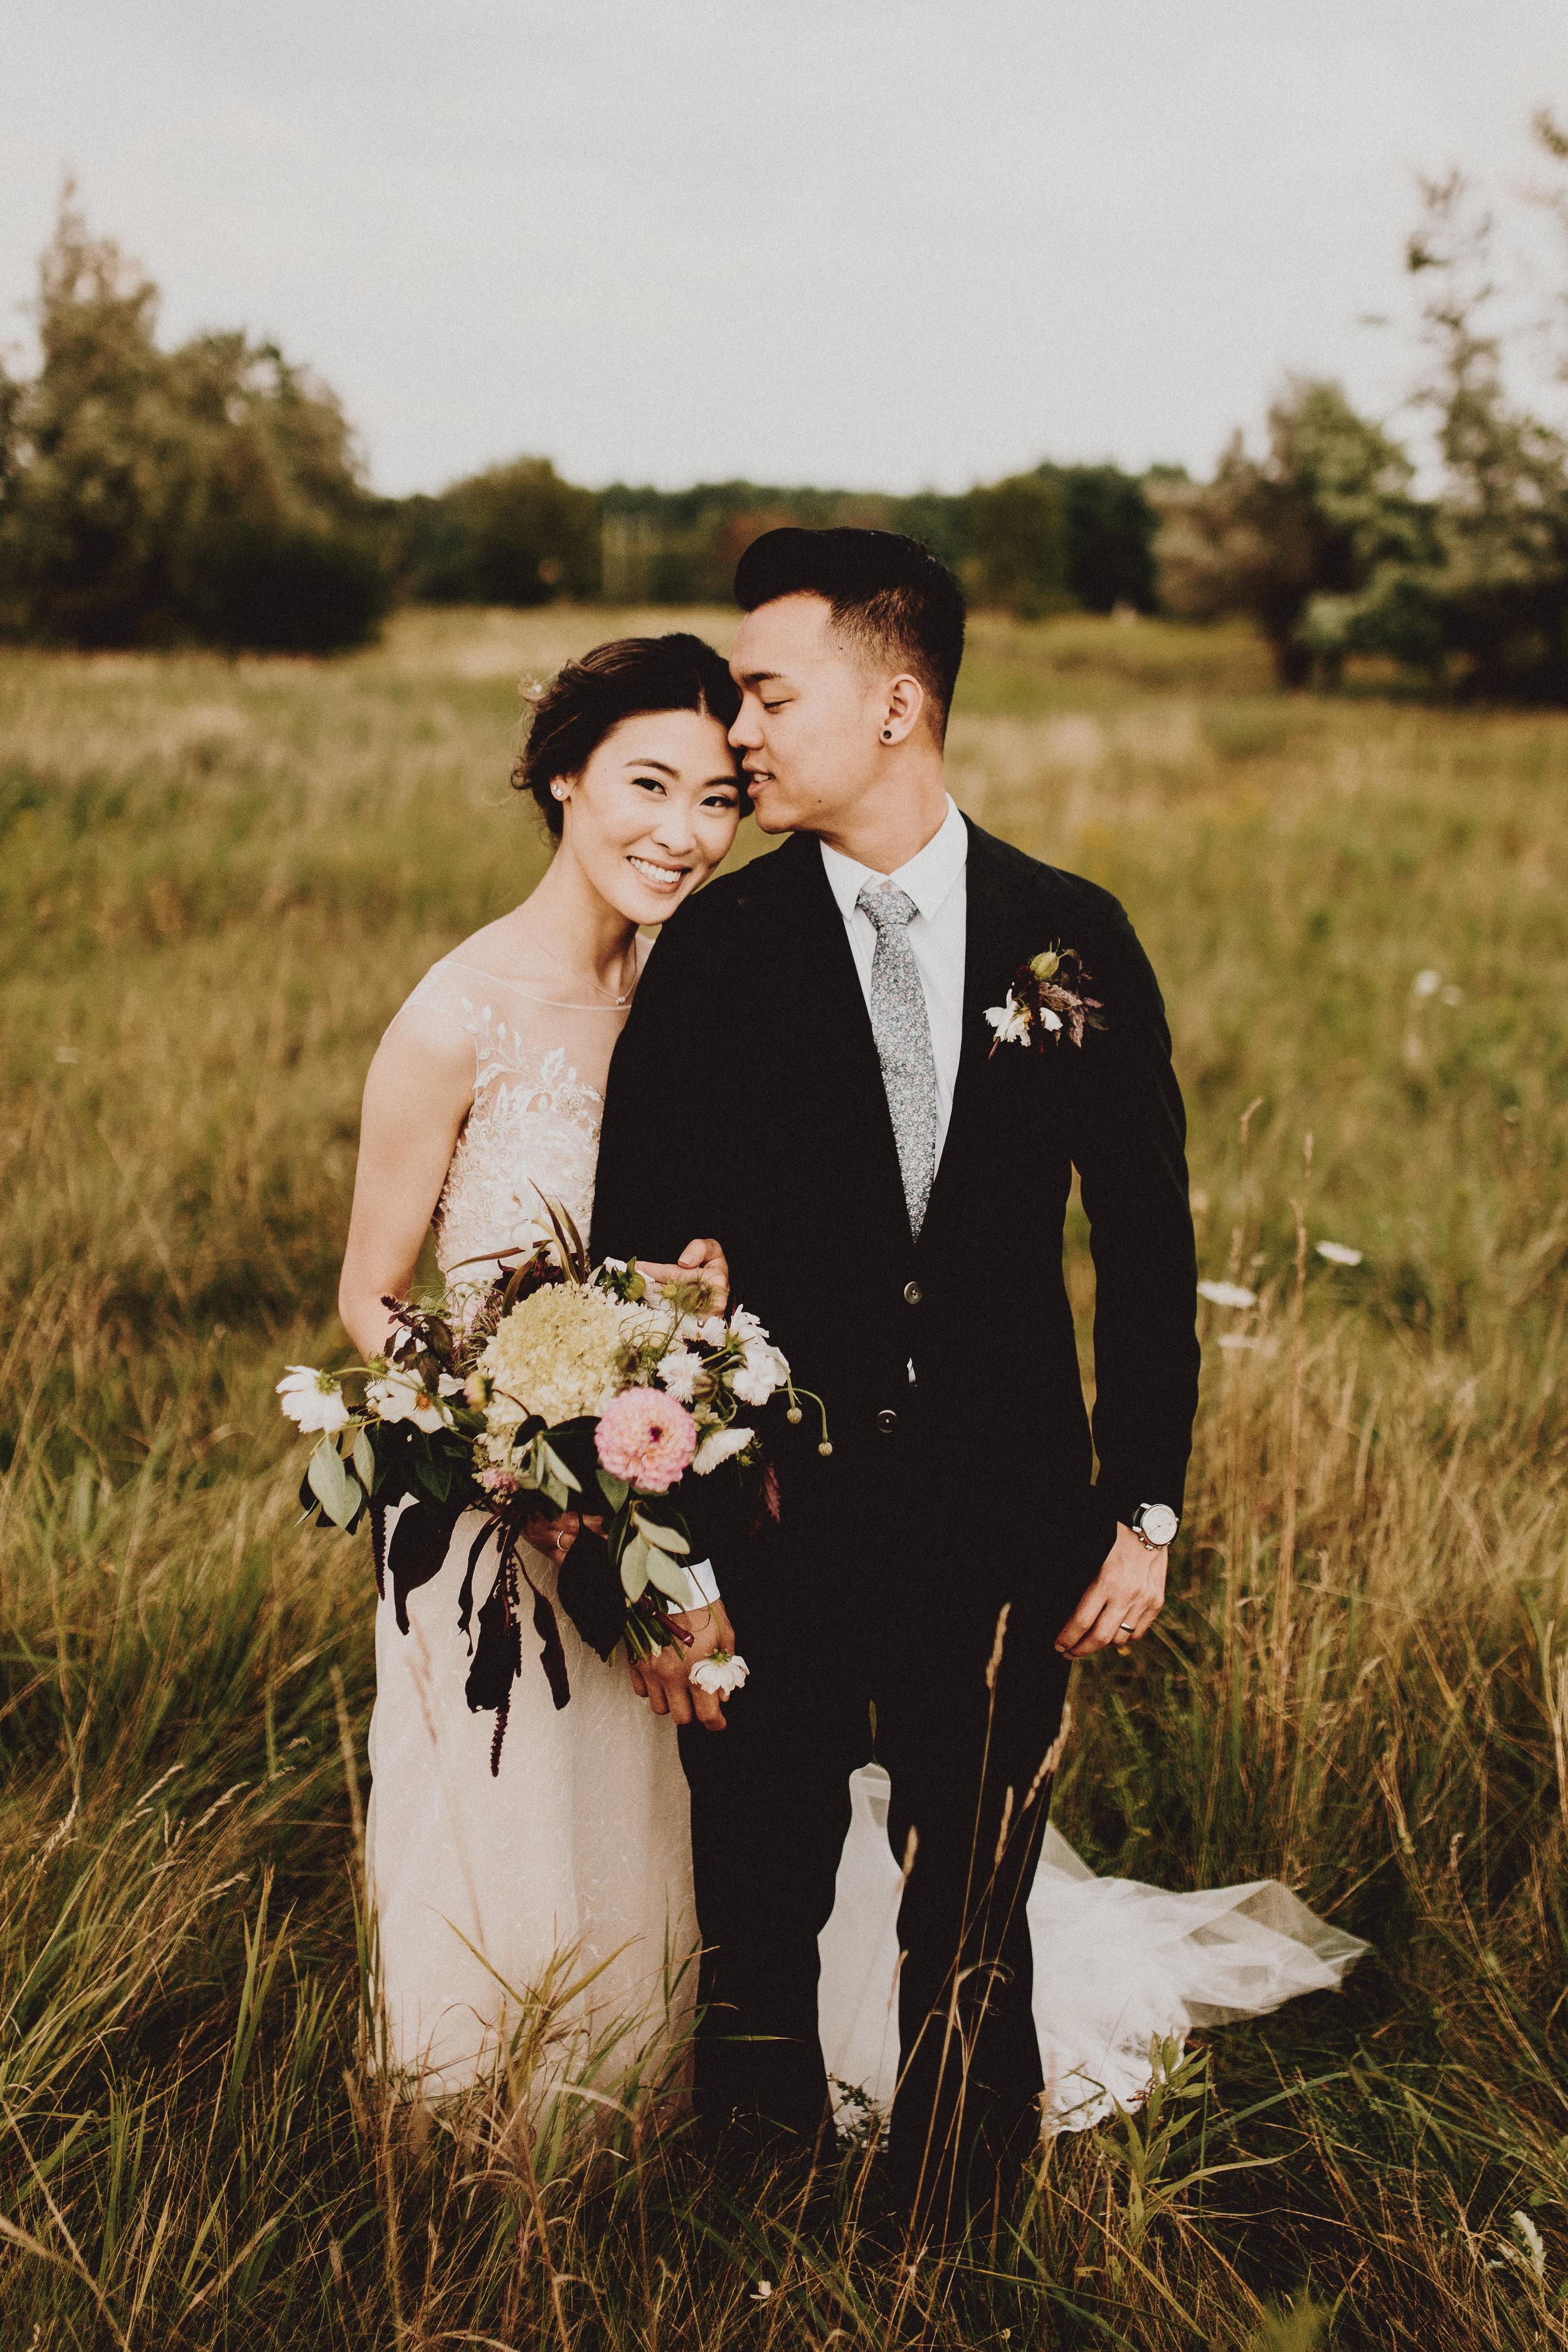 WeddingAlbumEdits-25.jpg